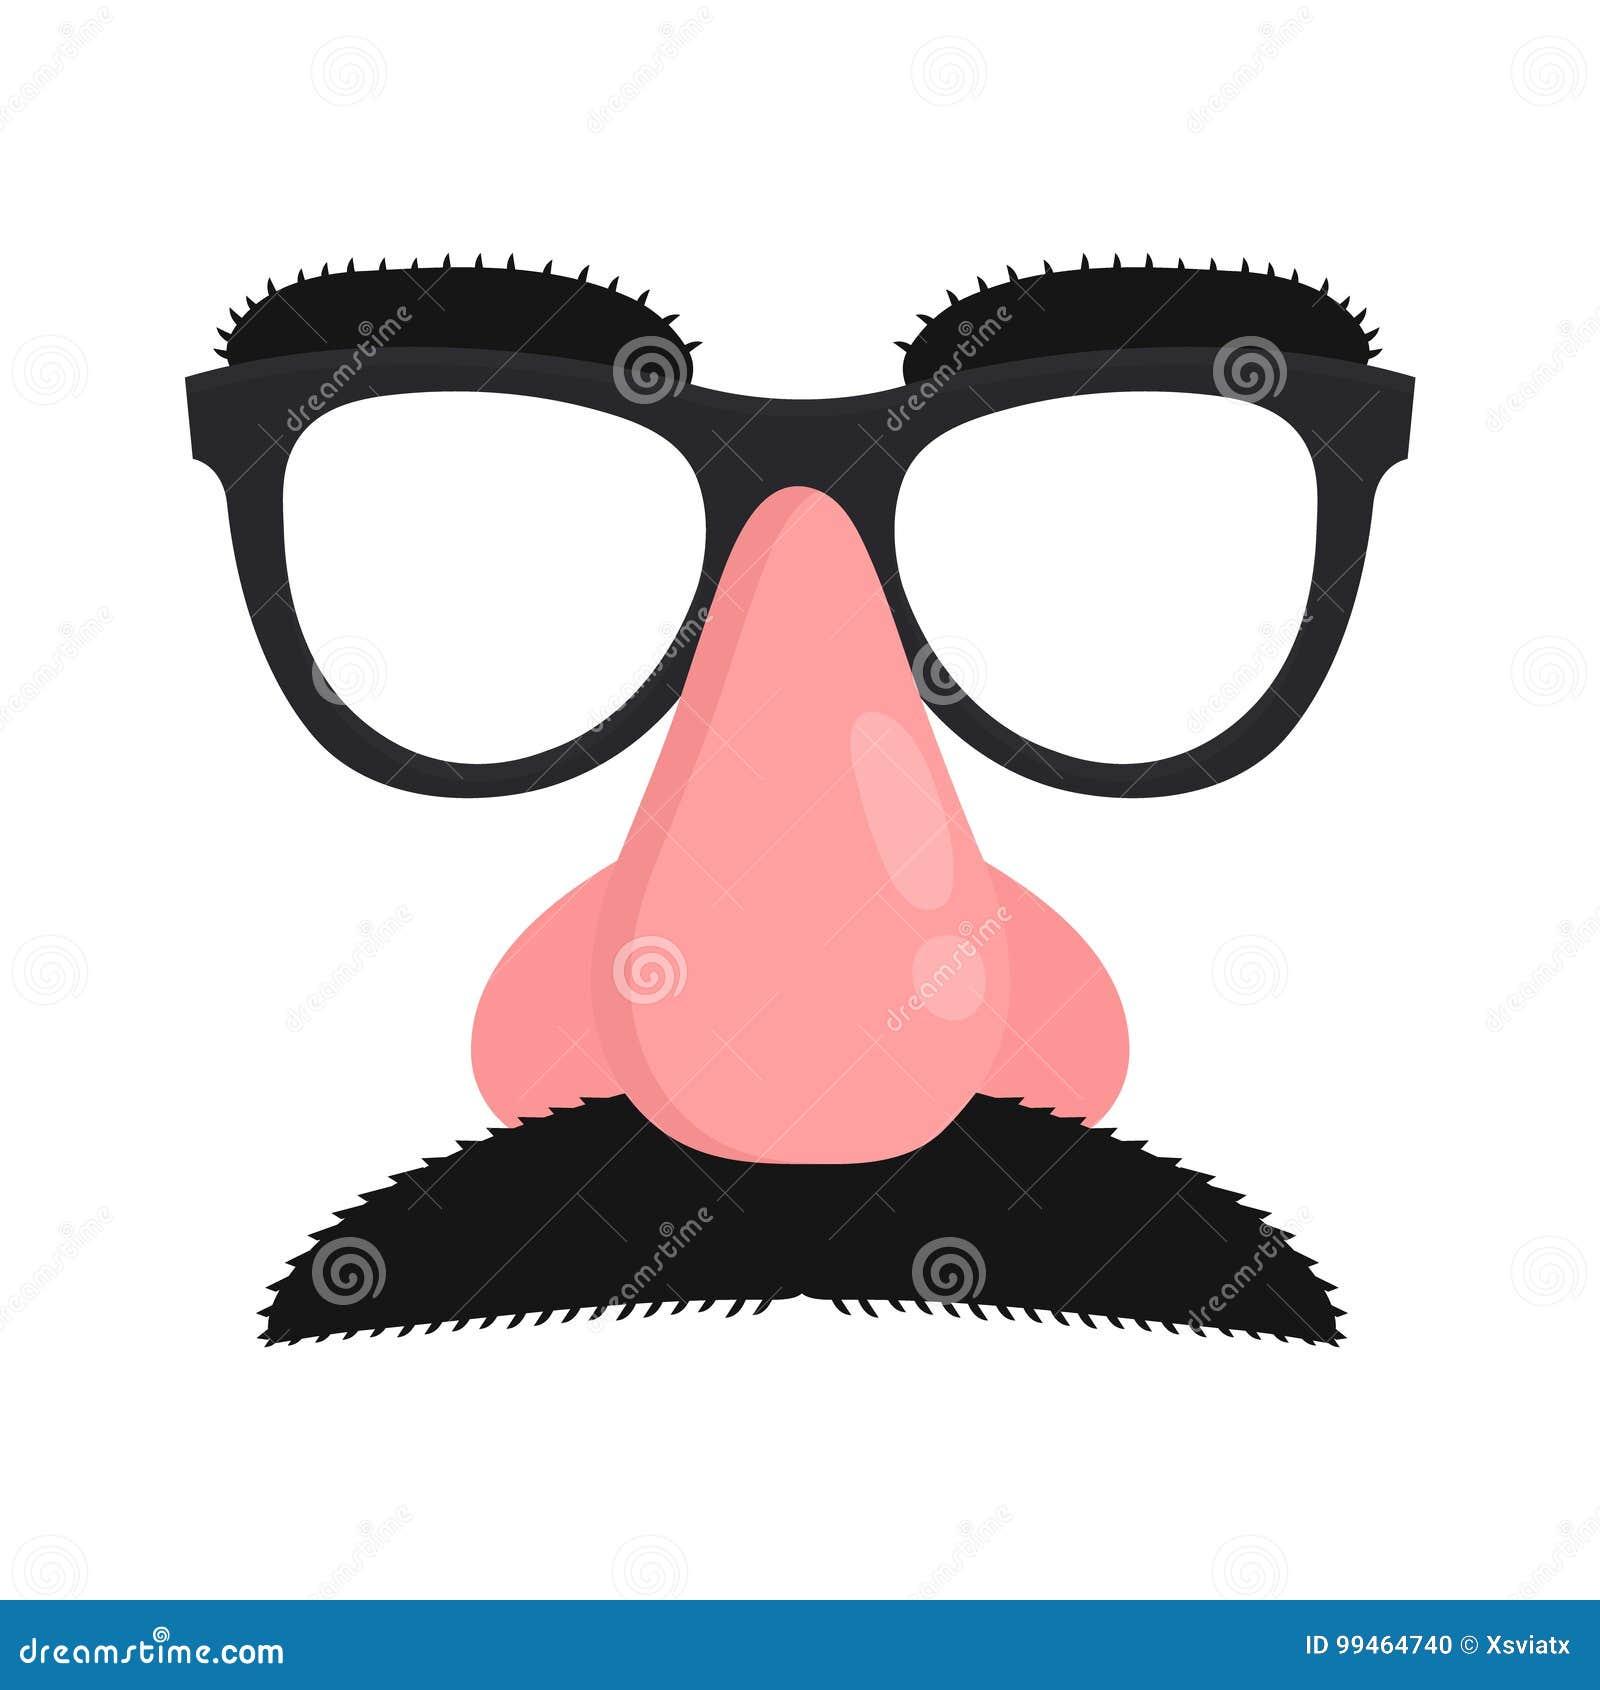 eef37f576d7d Disguise Joke Stock Illustrations – 433 Disguise Joke Stock Illustrations